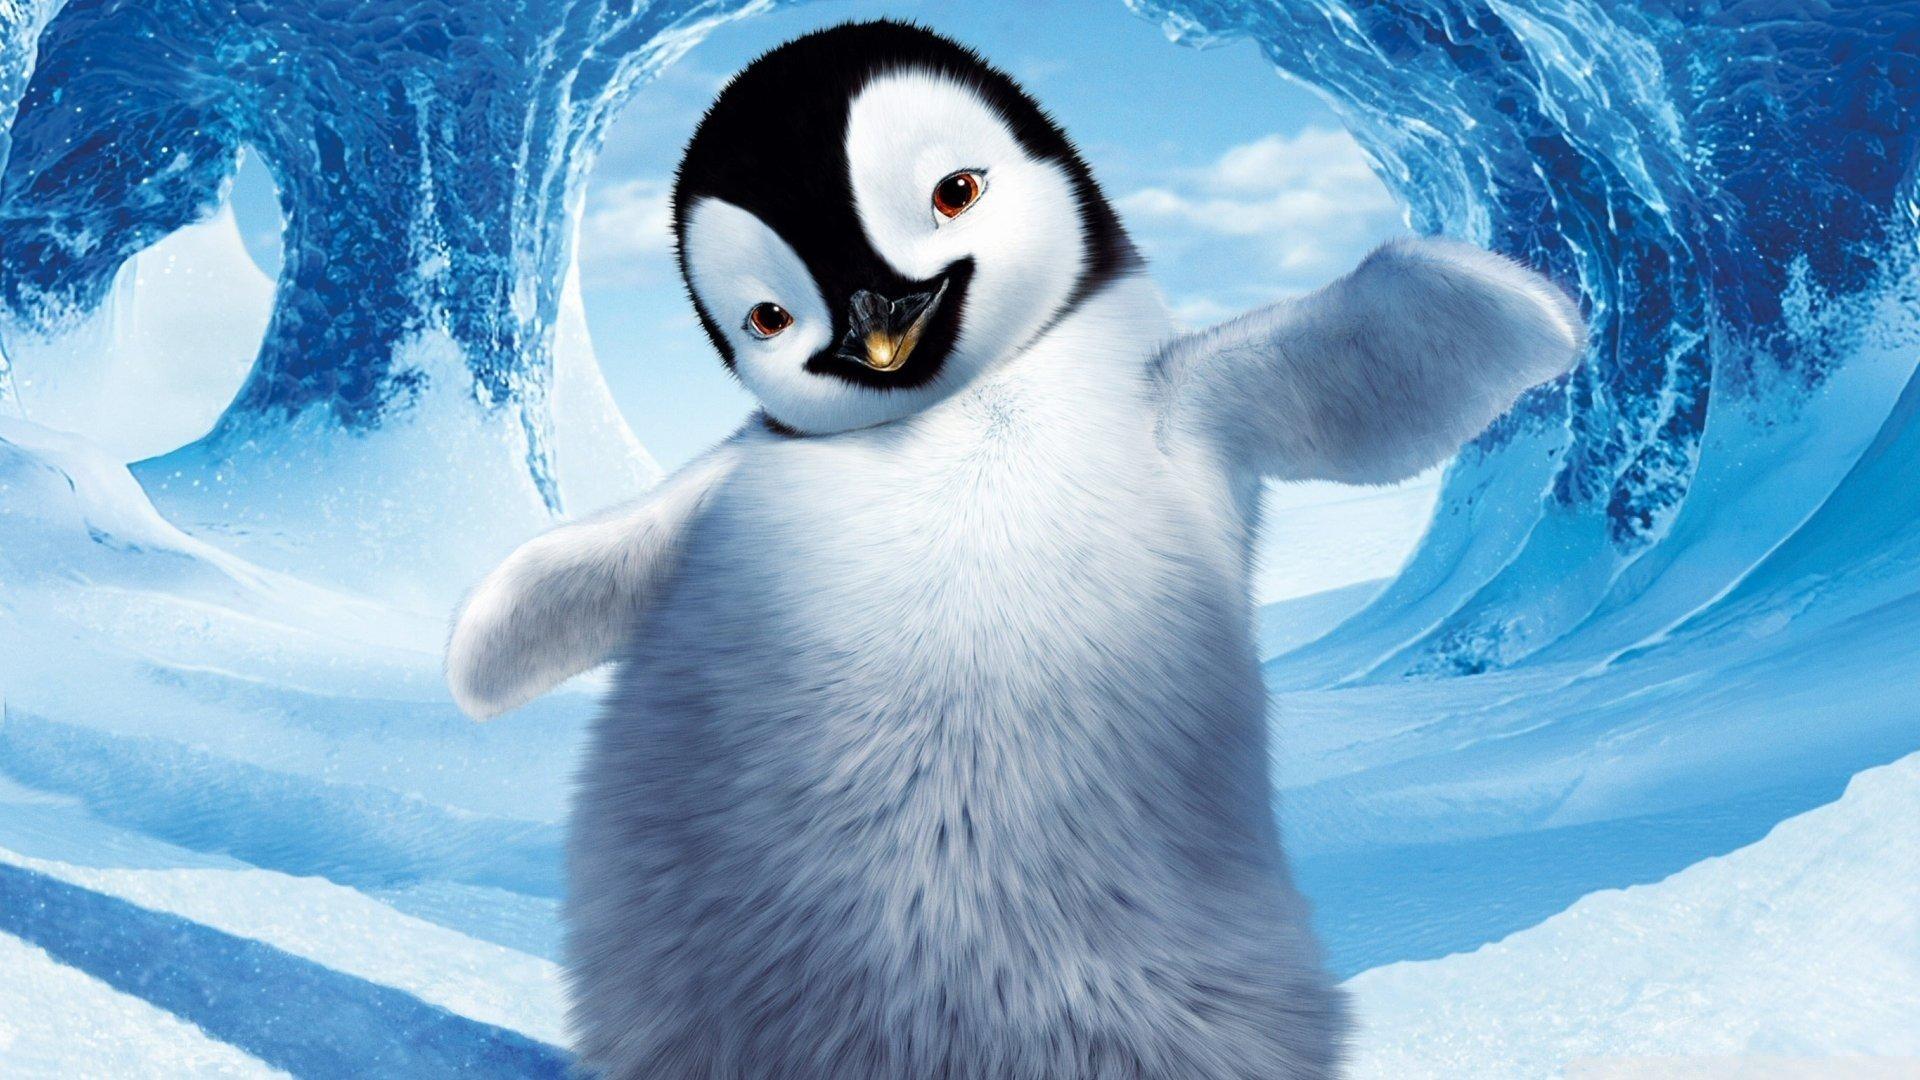 Happy feet movie full download | watch happy feet movie online.